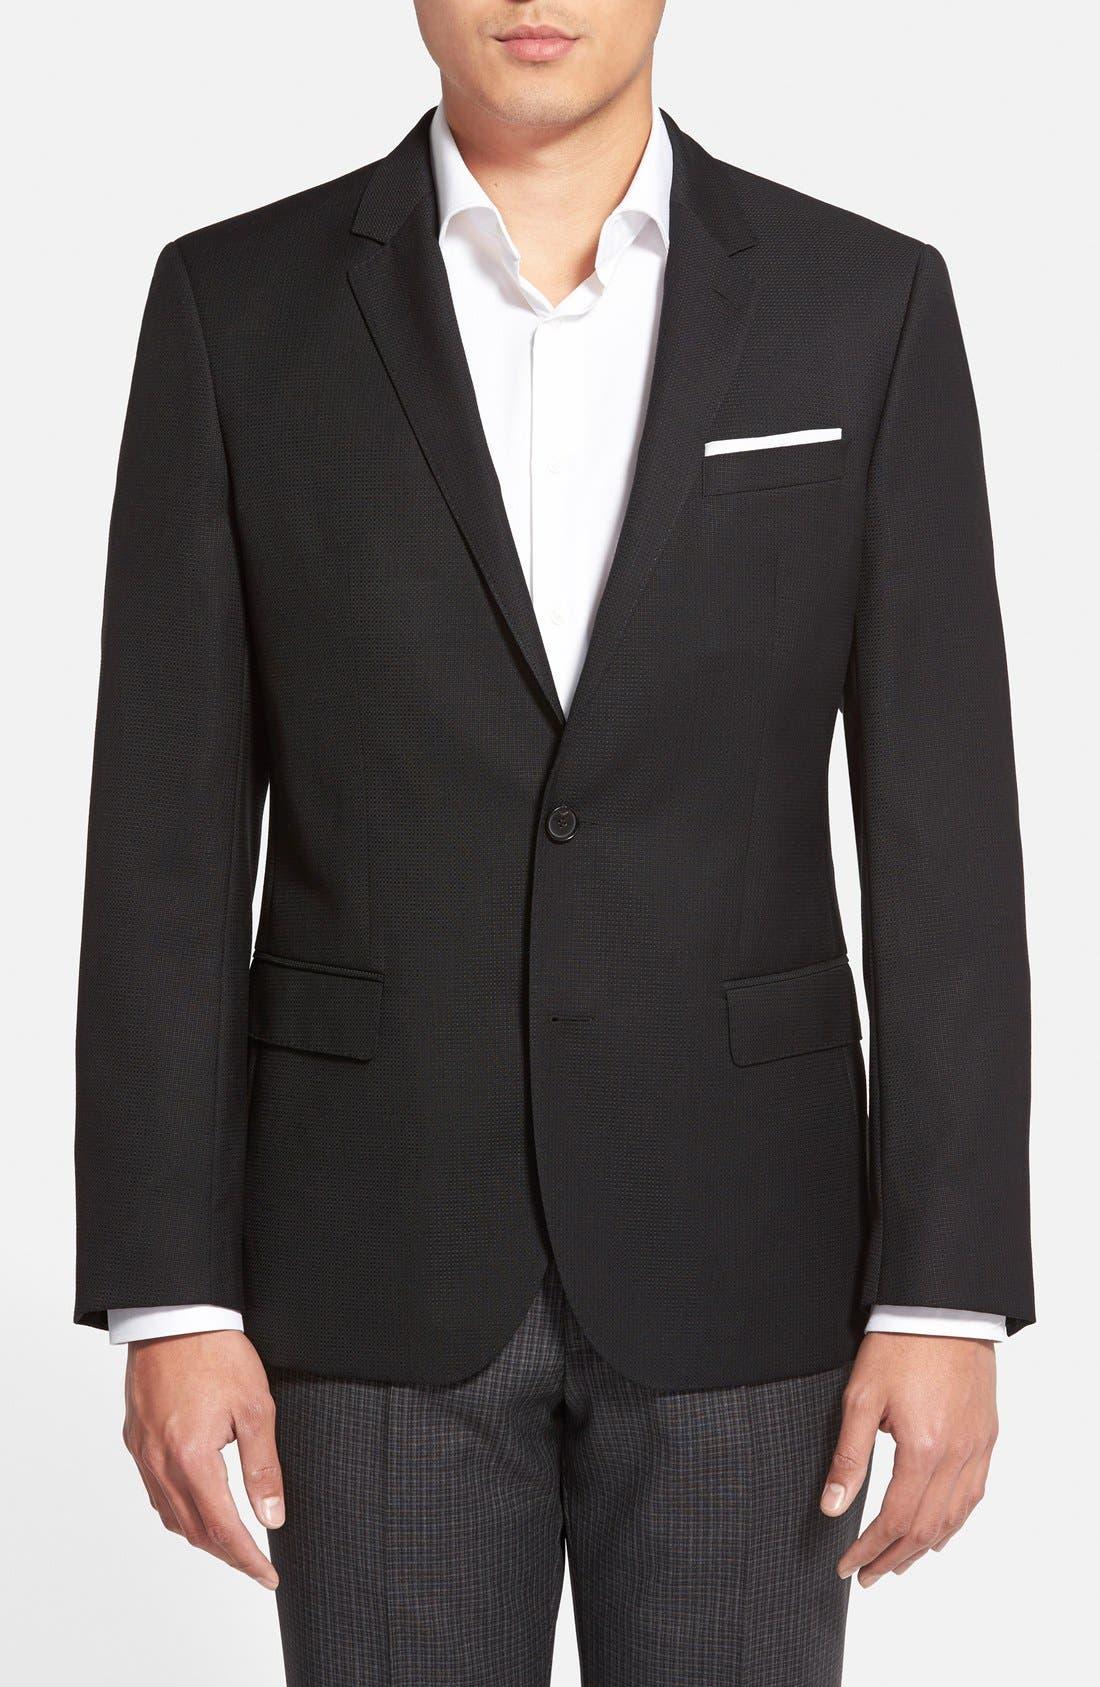 Hutch Trim Fit Wool Blazer,                             Main thumbnail 1, color,                             Black